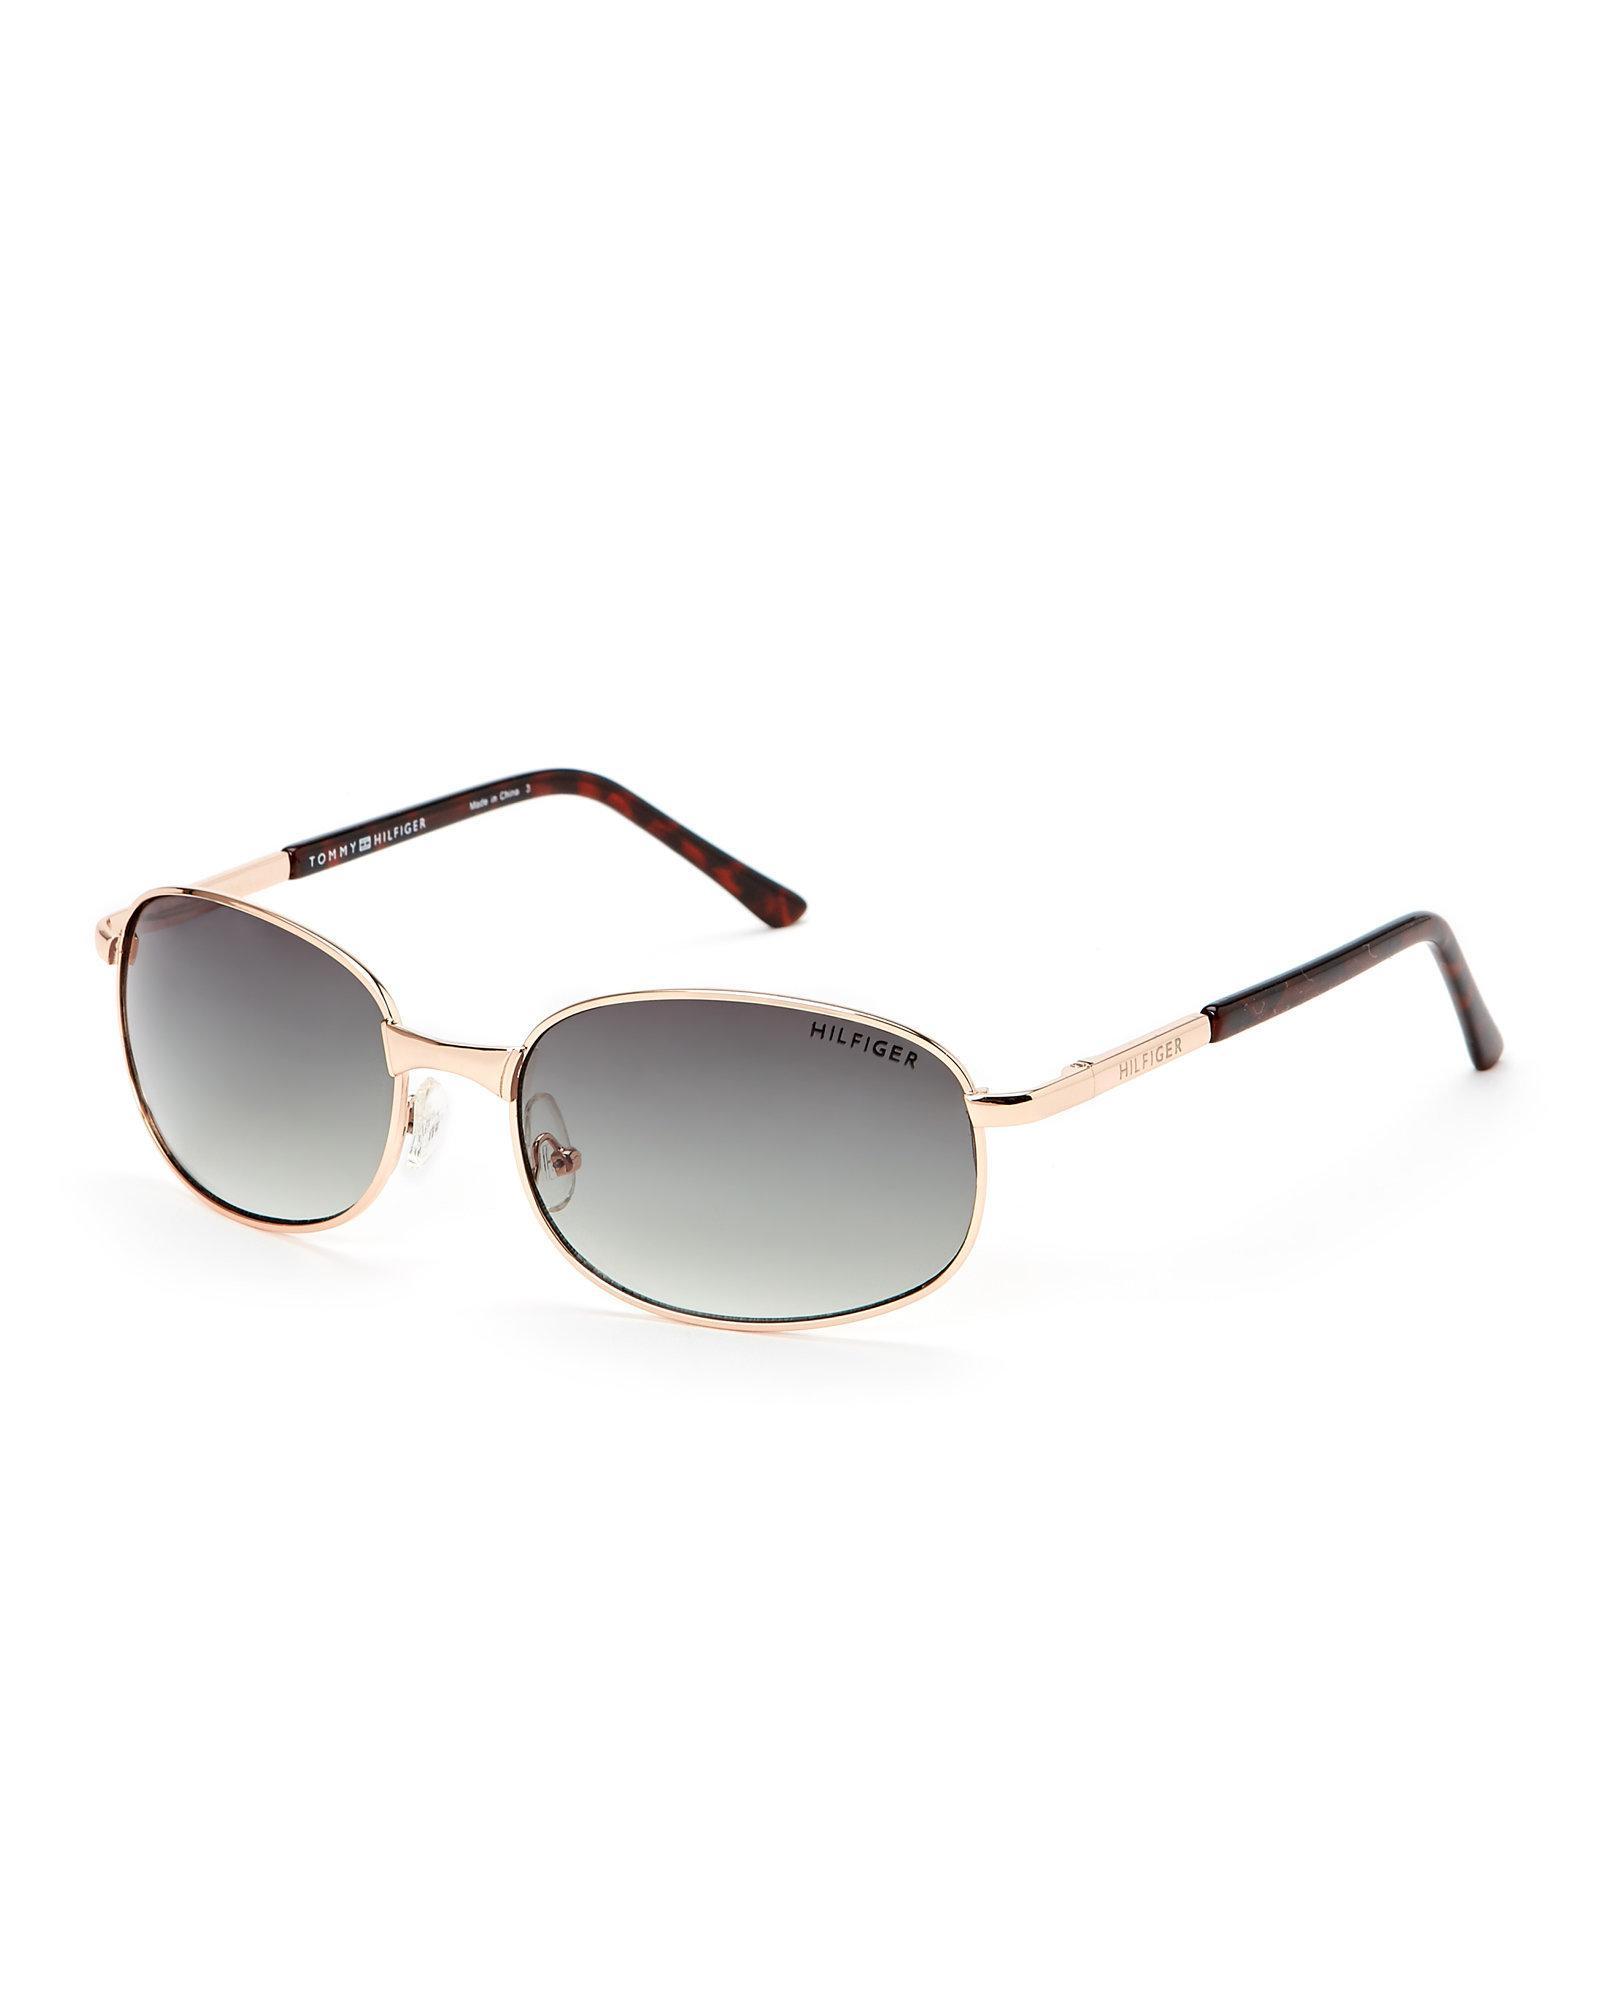 a1499860fb Lyst - Tommy Hilfiger Gold-Tone Steve Oval Sunglasses in Metallic